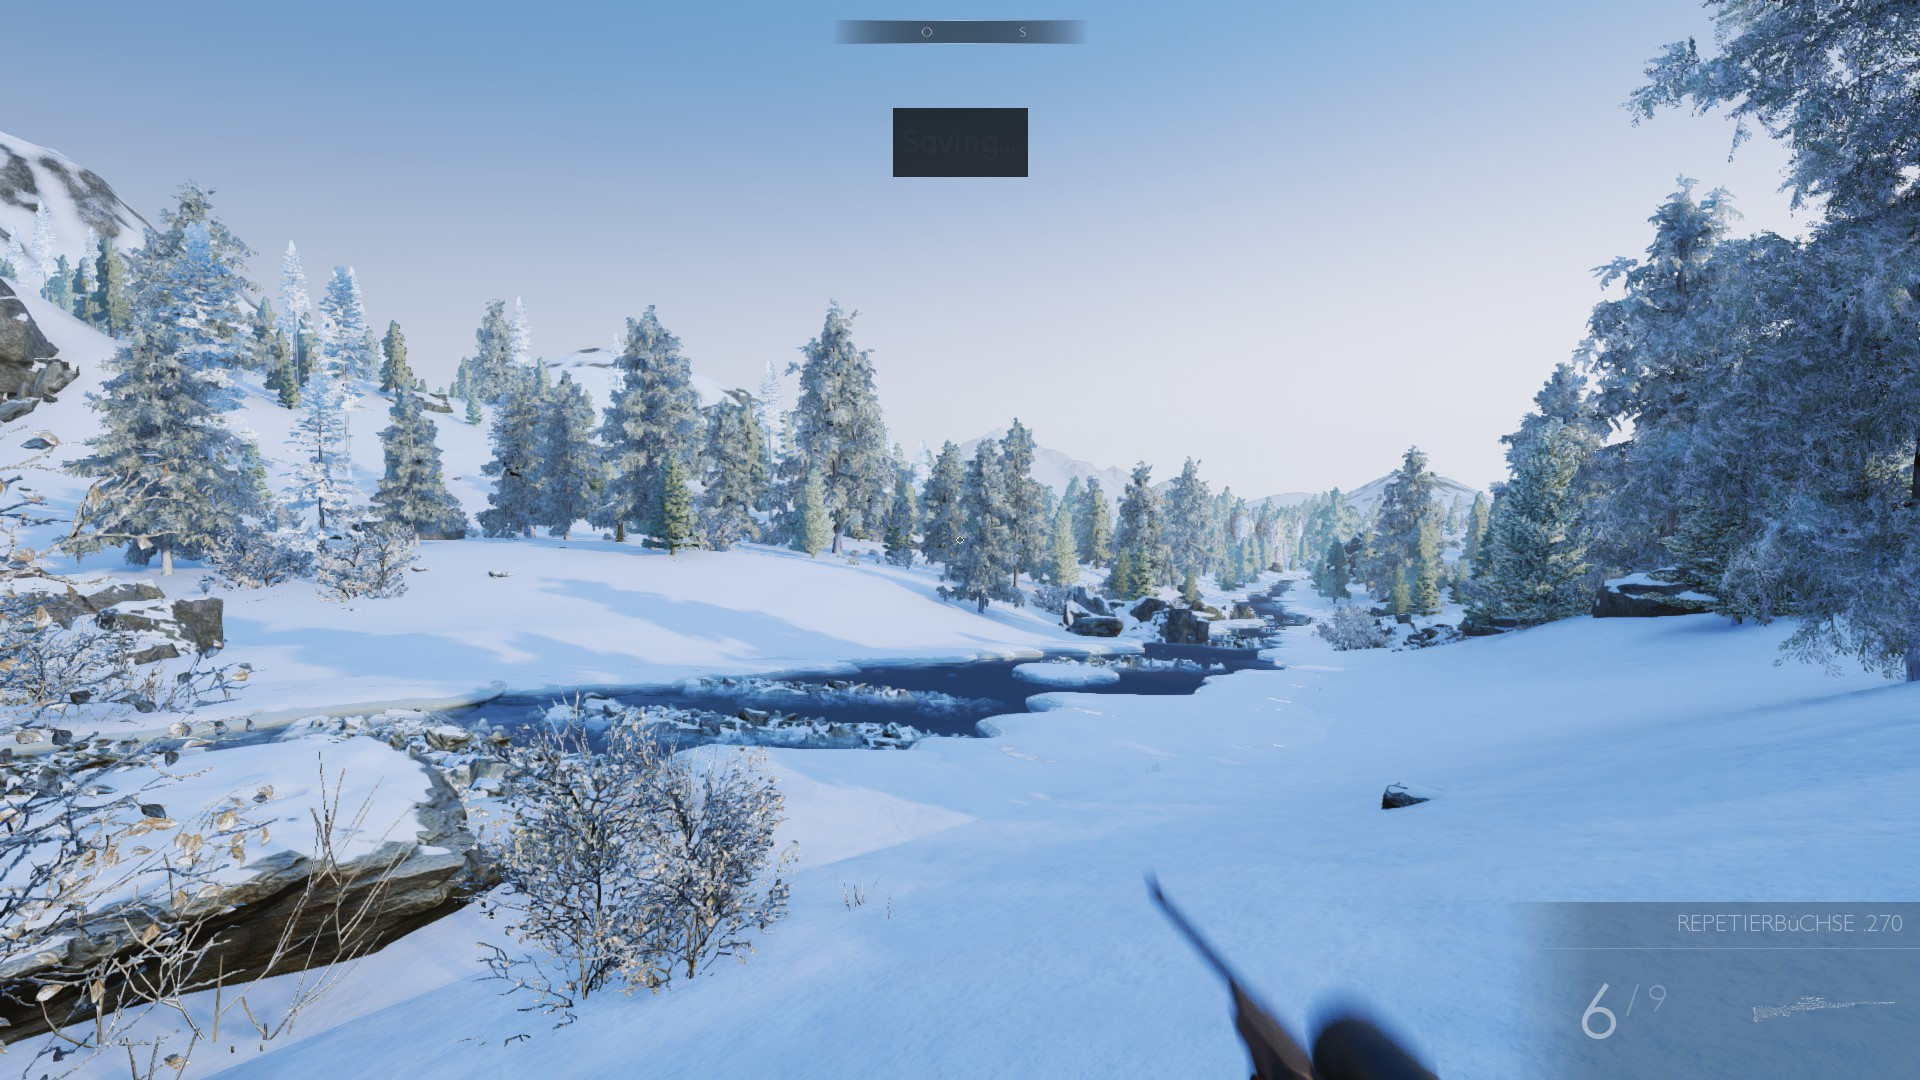 Jagd Entfernungsmesser Rätsel : Test zum spiel hunting simulator die lustige jagd ist